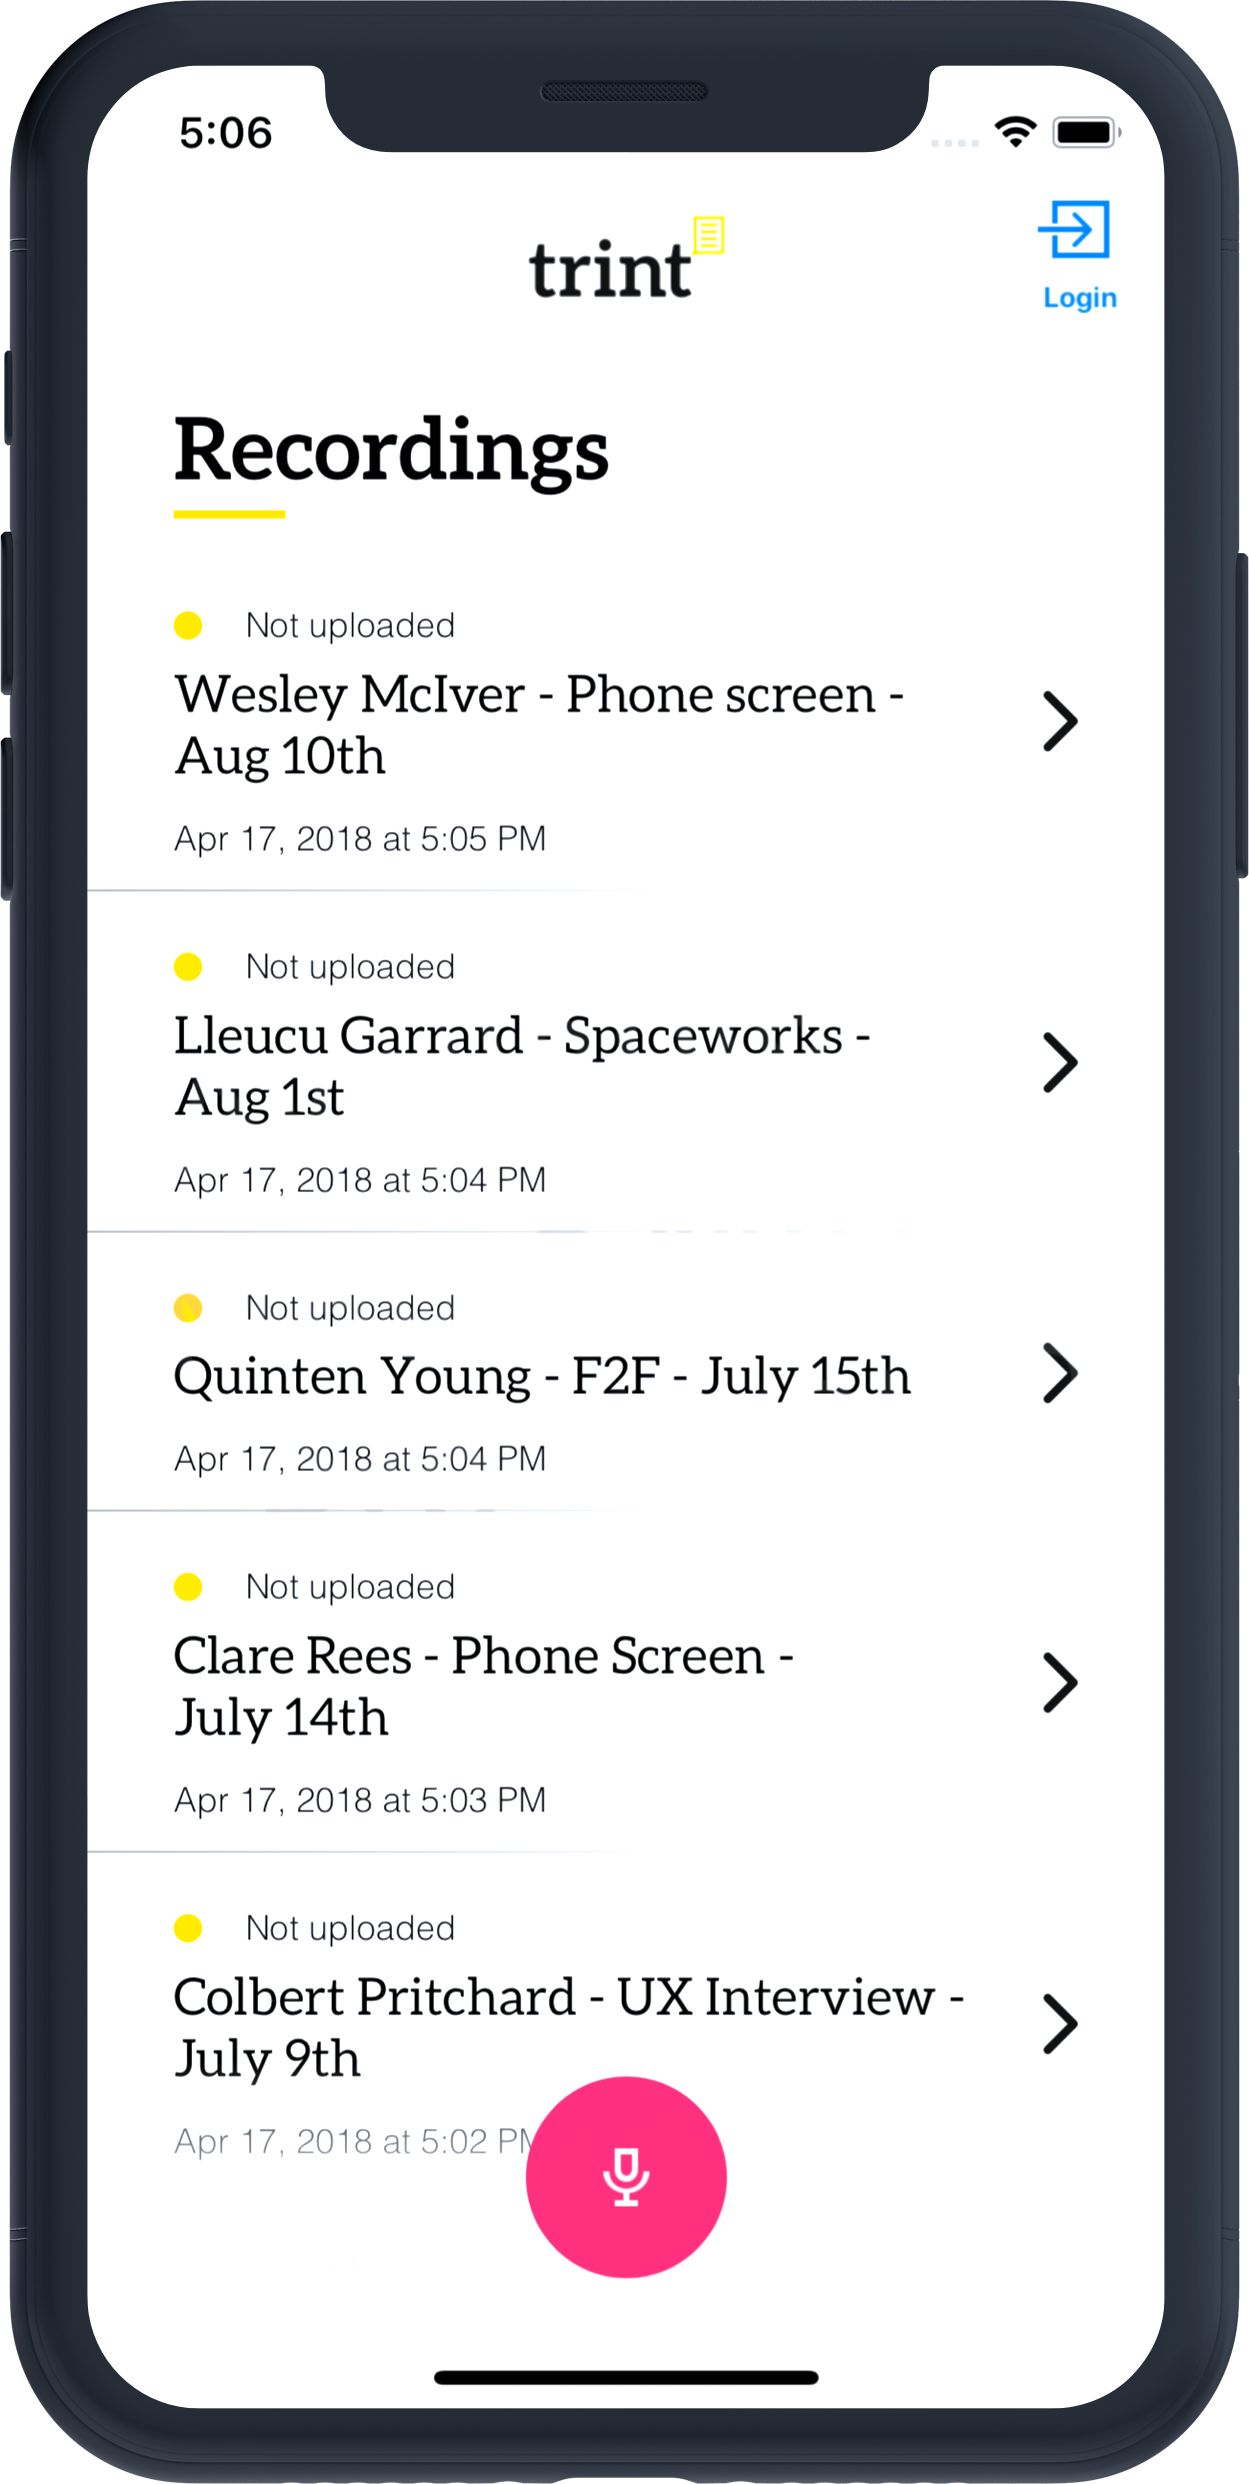 Trint mobile transcription app for iPhone